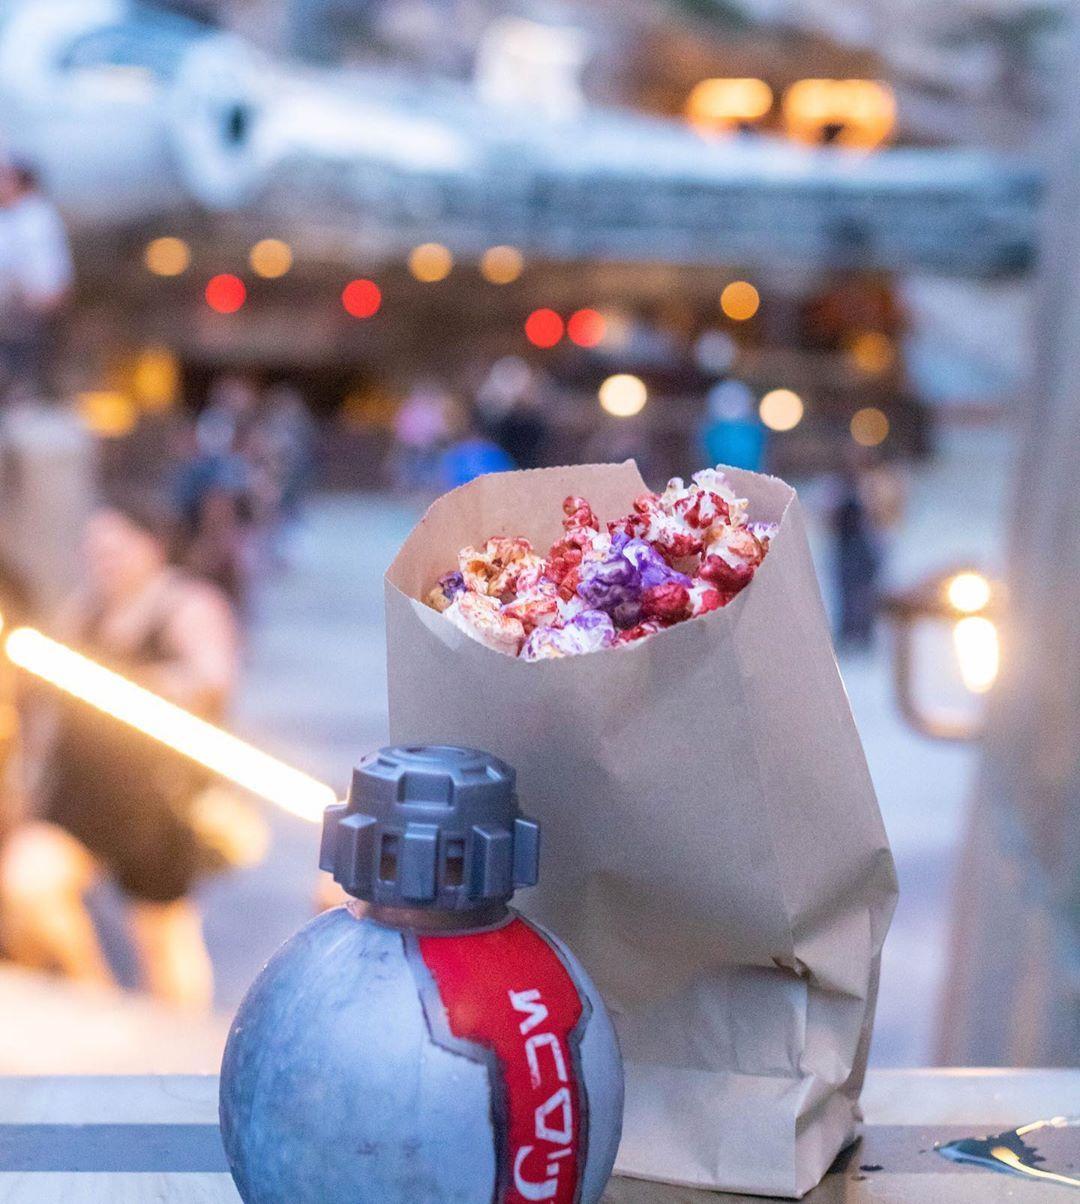 Gluten Free Popcorn from in Walt Disney World's Galaxy's